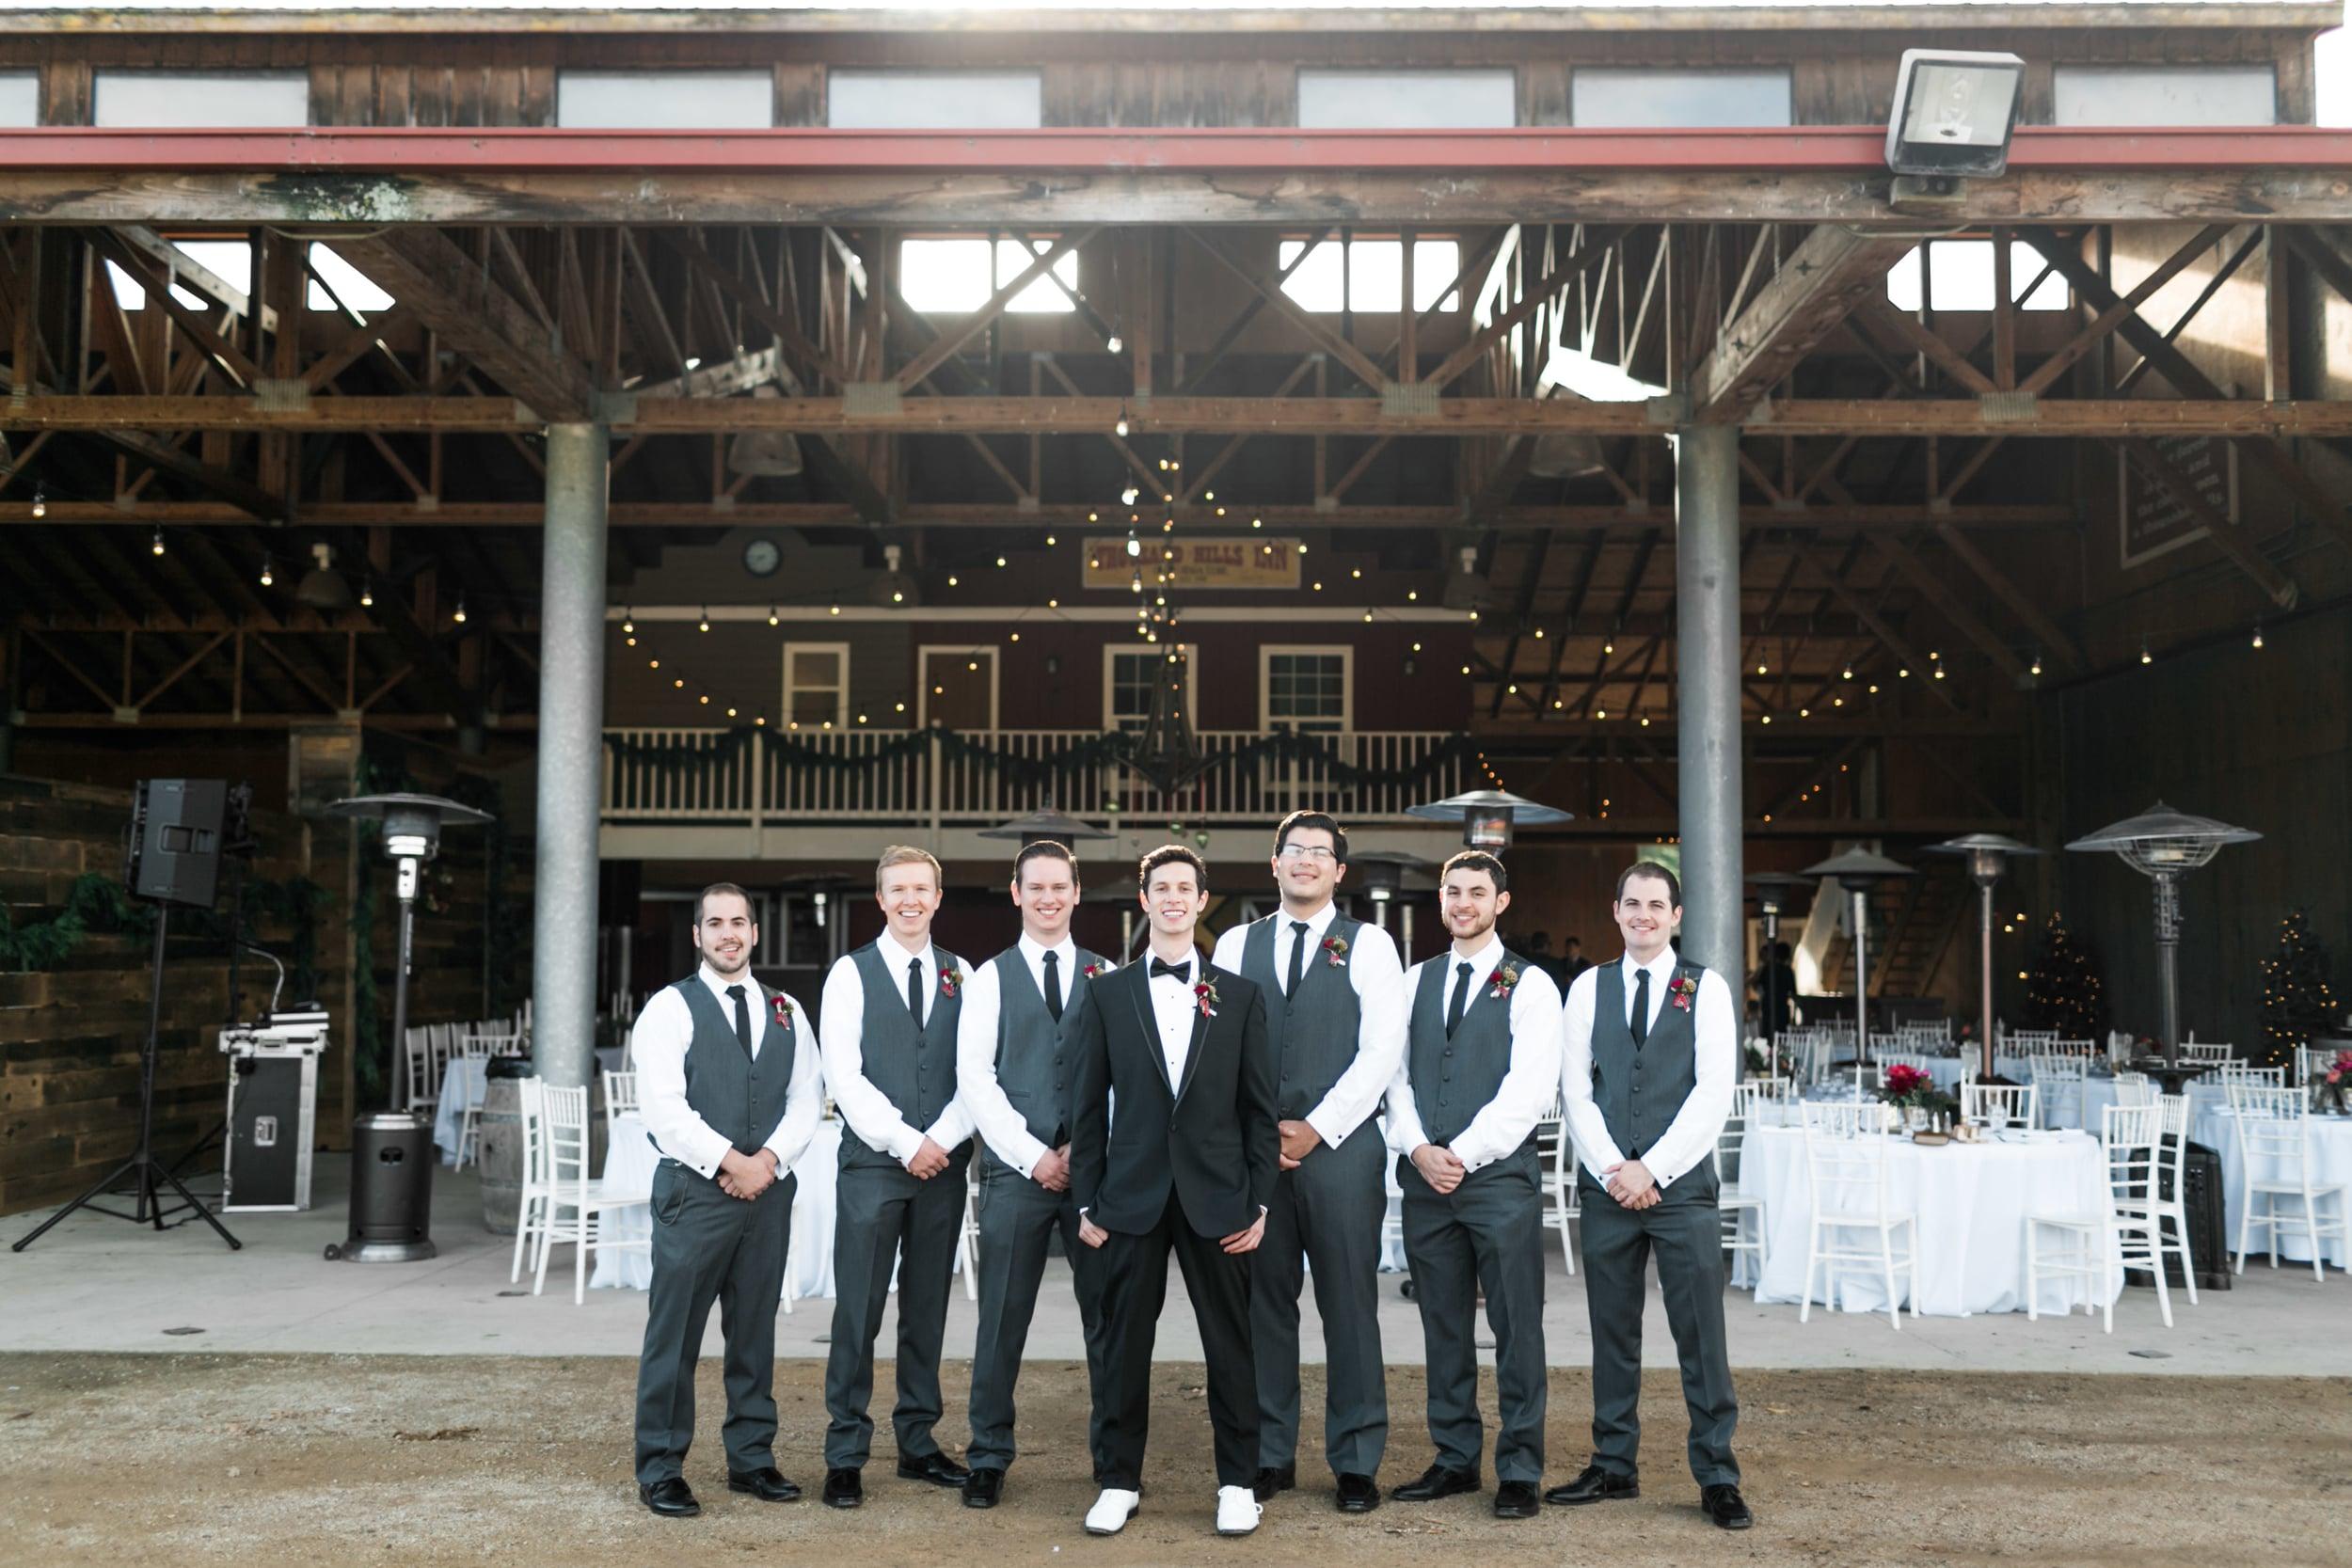 Natalie_Schutt_Photography_Winter_Wedding_San_Luis_Obispo-14.jpg